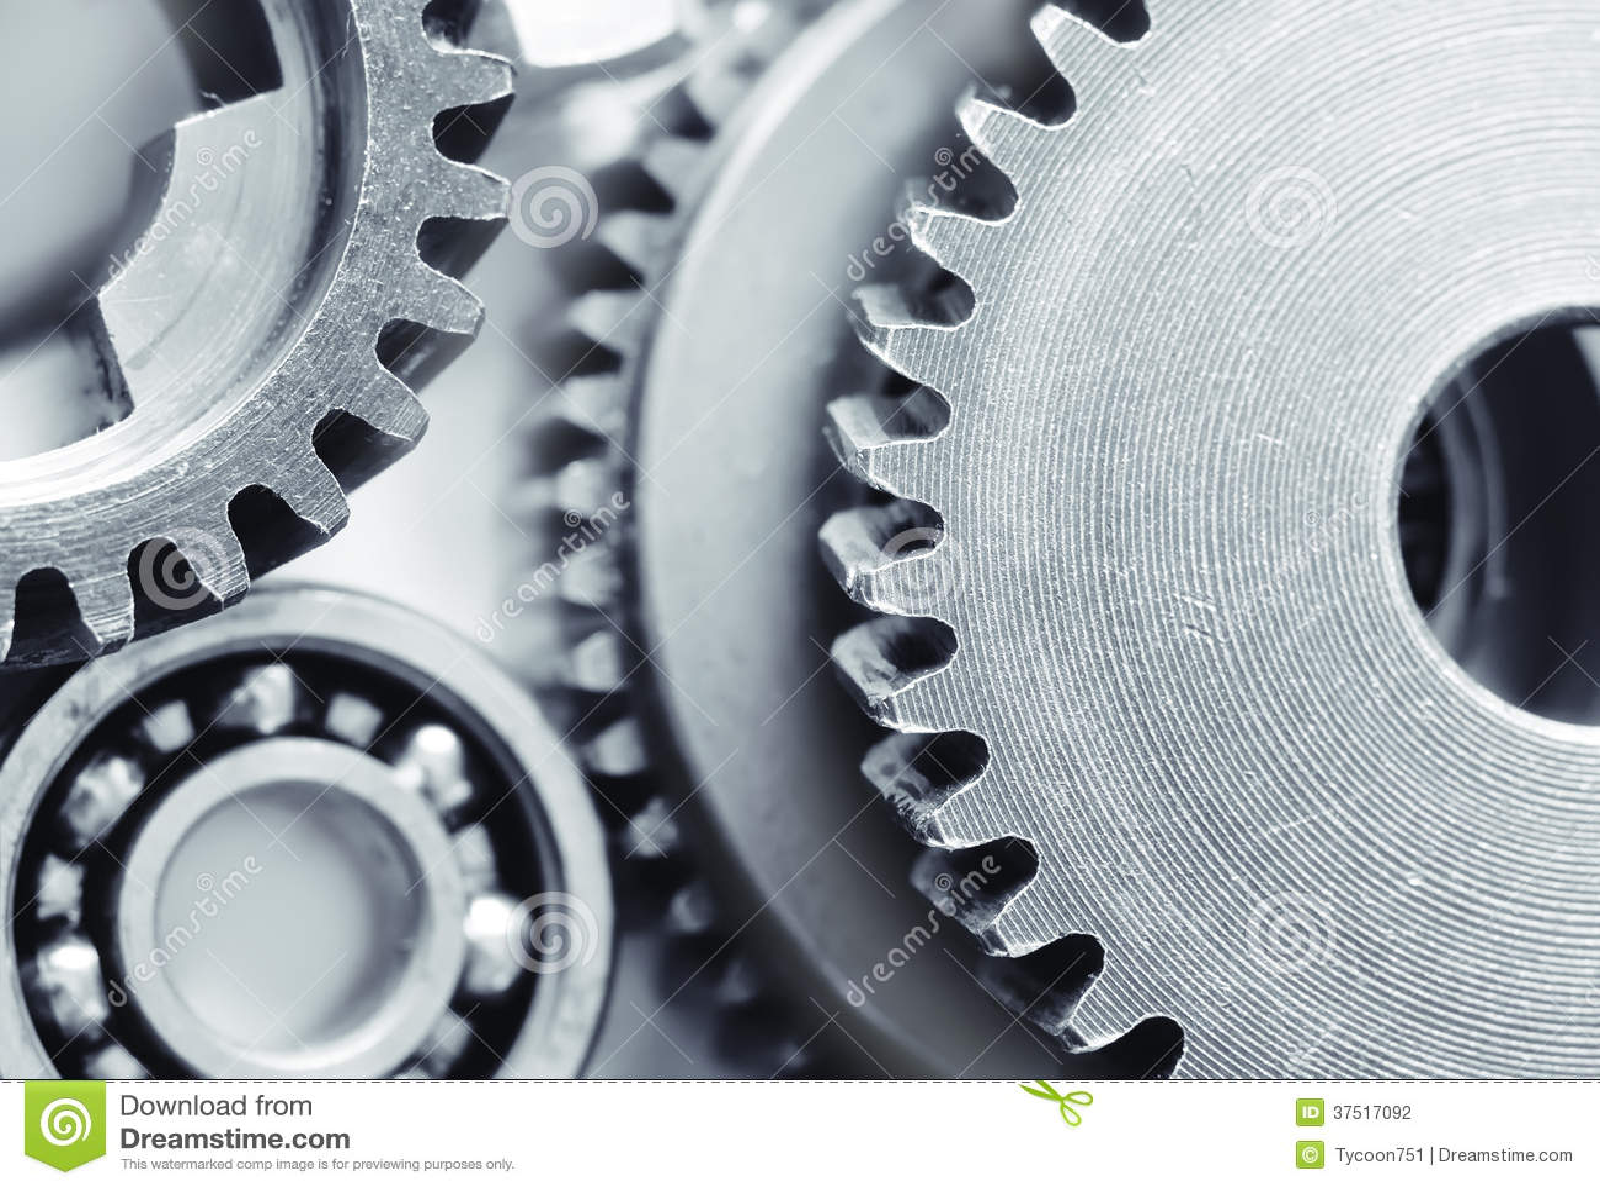 Trinquetes mecánicos